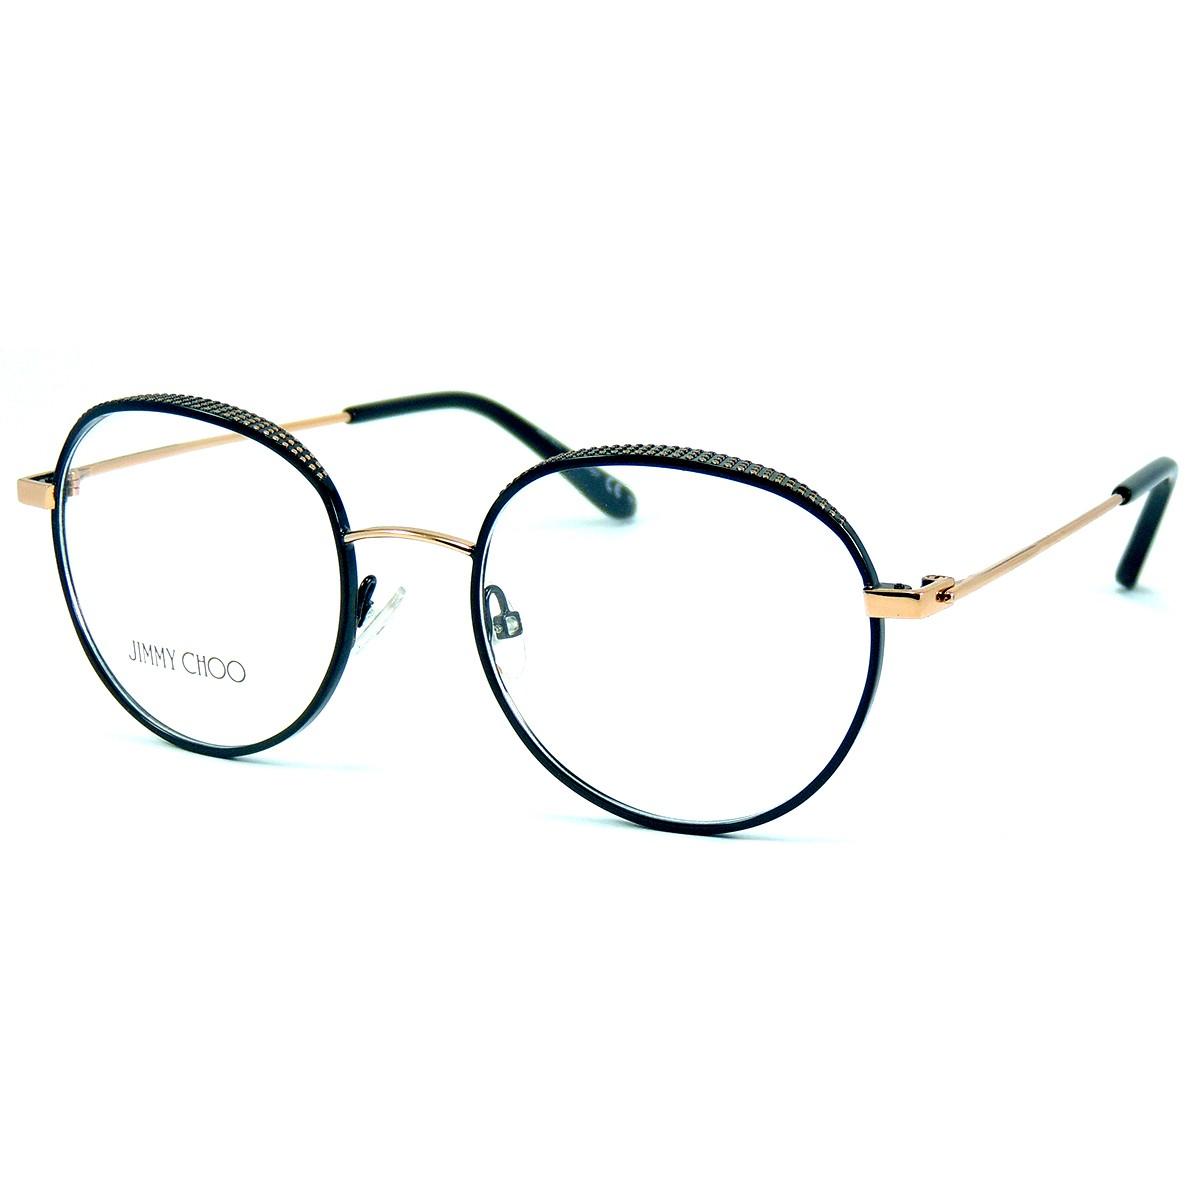 8b842ed04 Compre Óculos de Grau Jimmy Choo em 10X | Tri-Jóia Shop